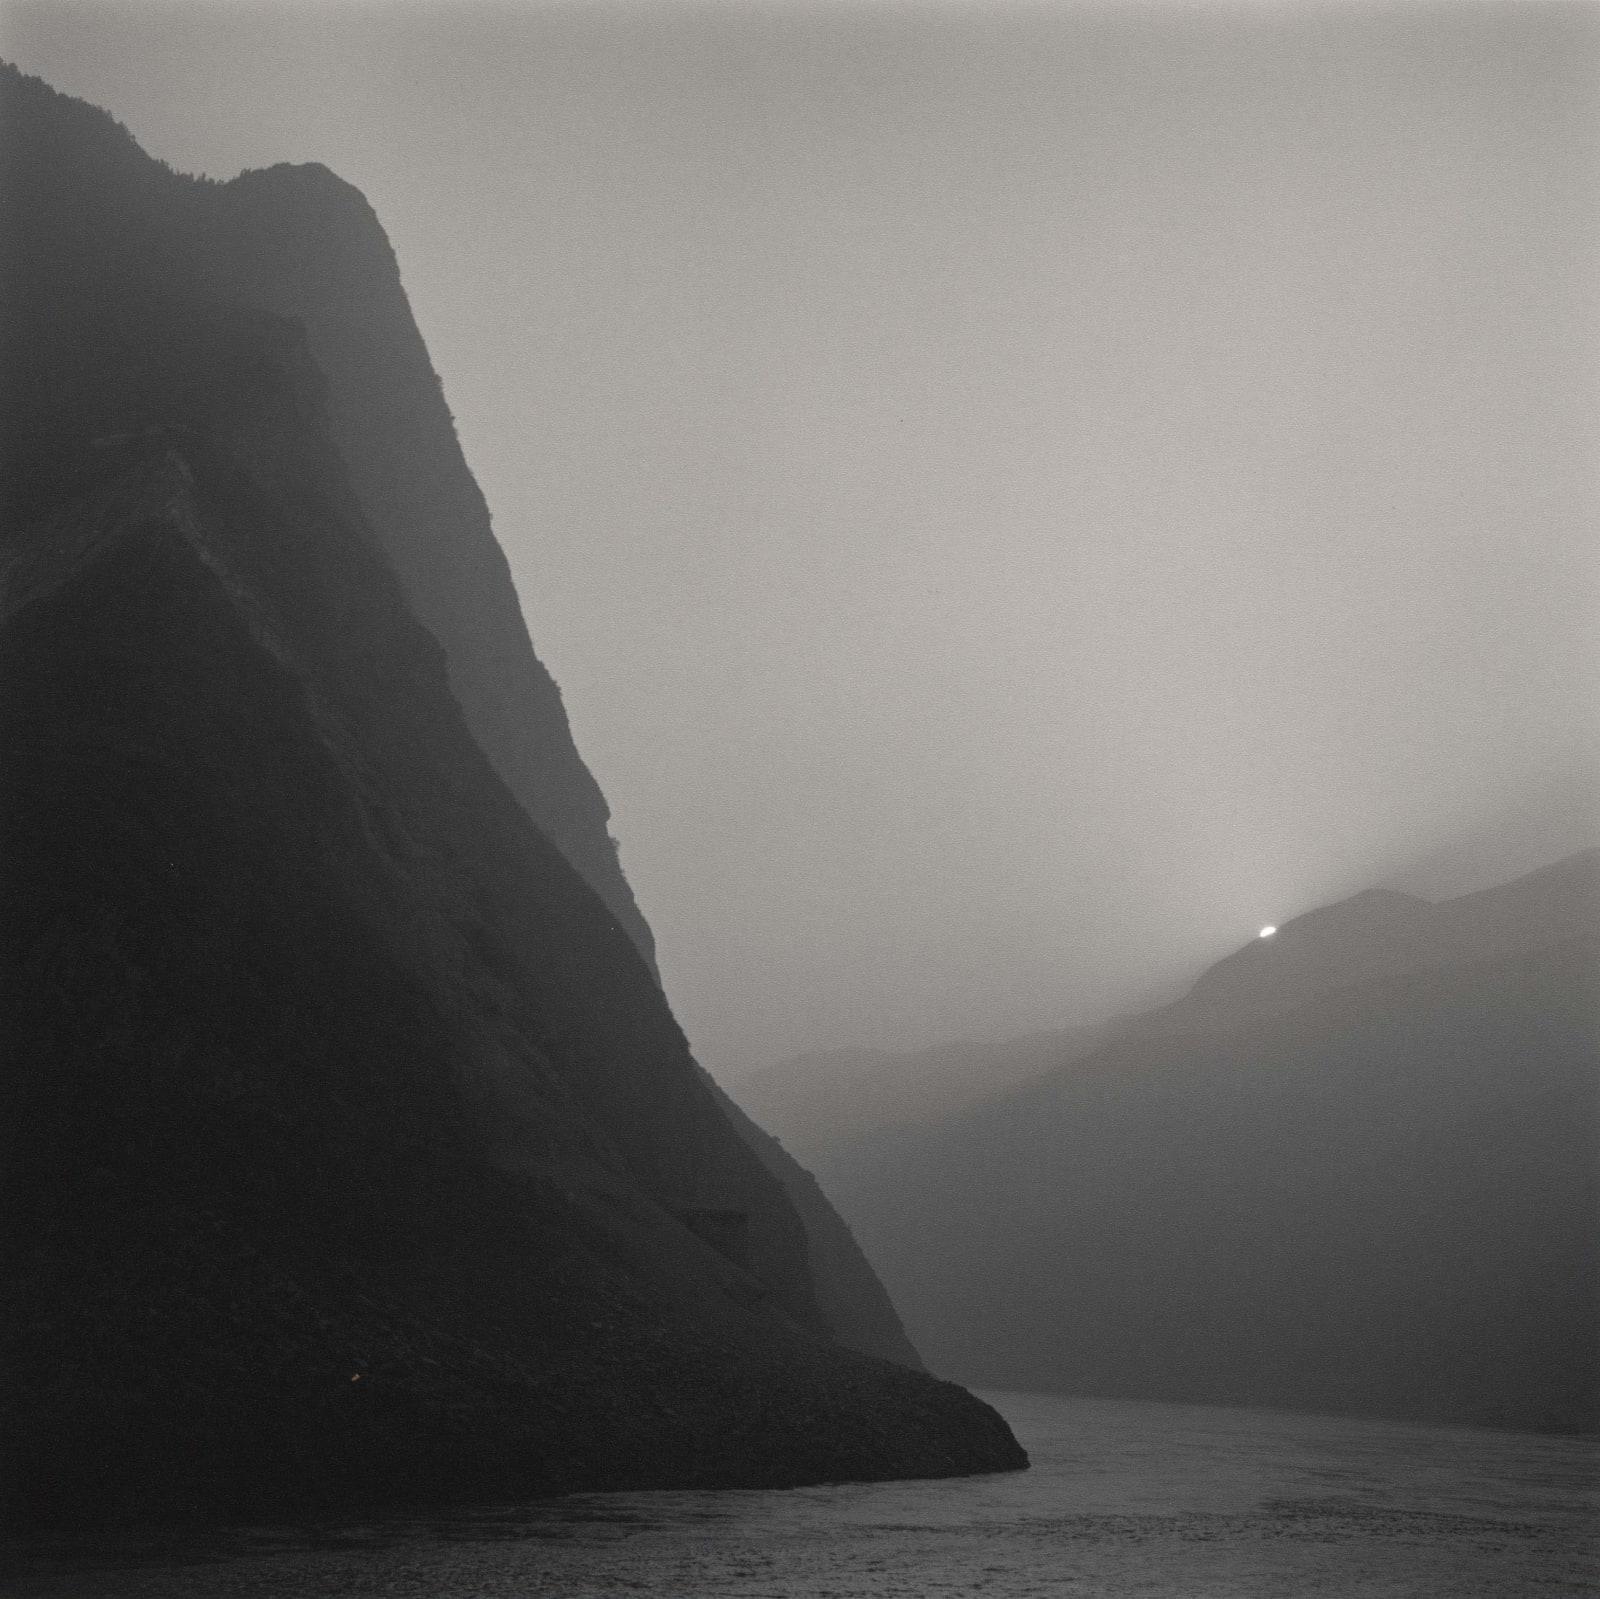 Lynn Davis photograph of Three Gorges, Yangtze River, China, with sun setting along mountain silhouette